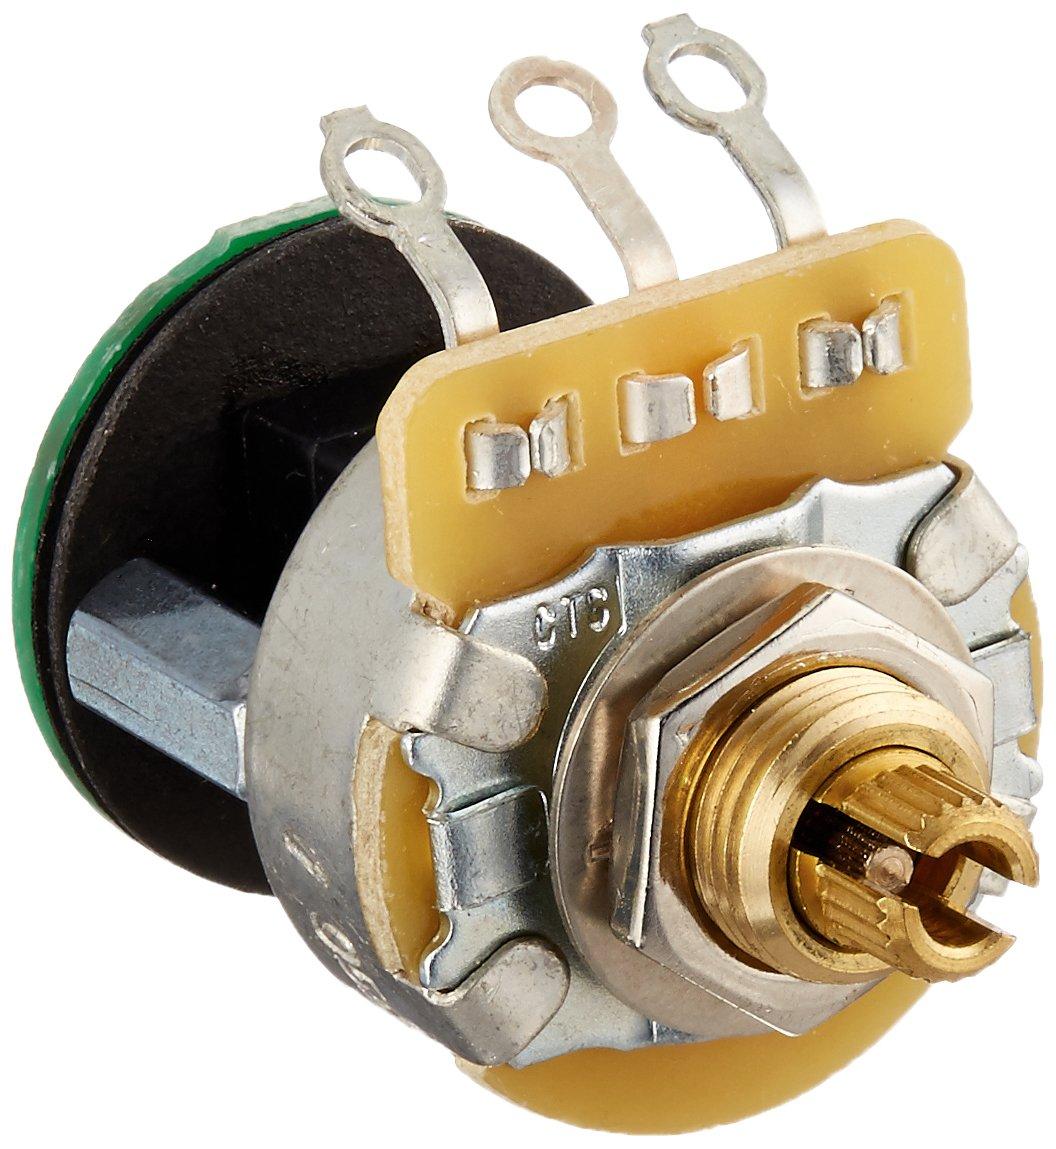 Fender パーツ S-1™ 250K Switch/Pot for Strat  ポット B00LJY35QW